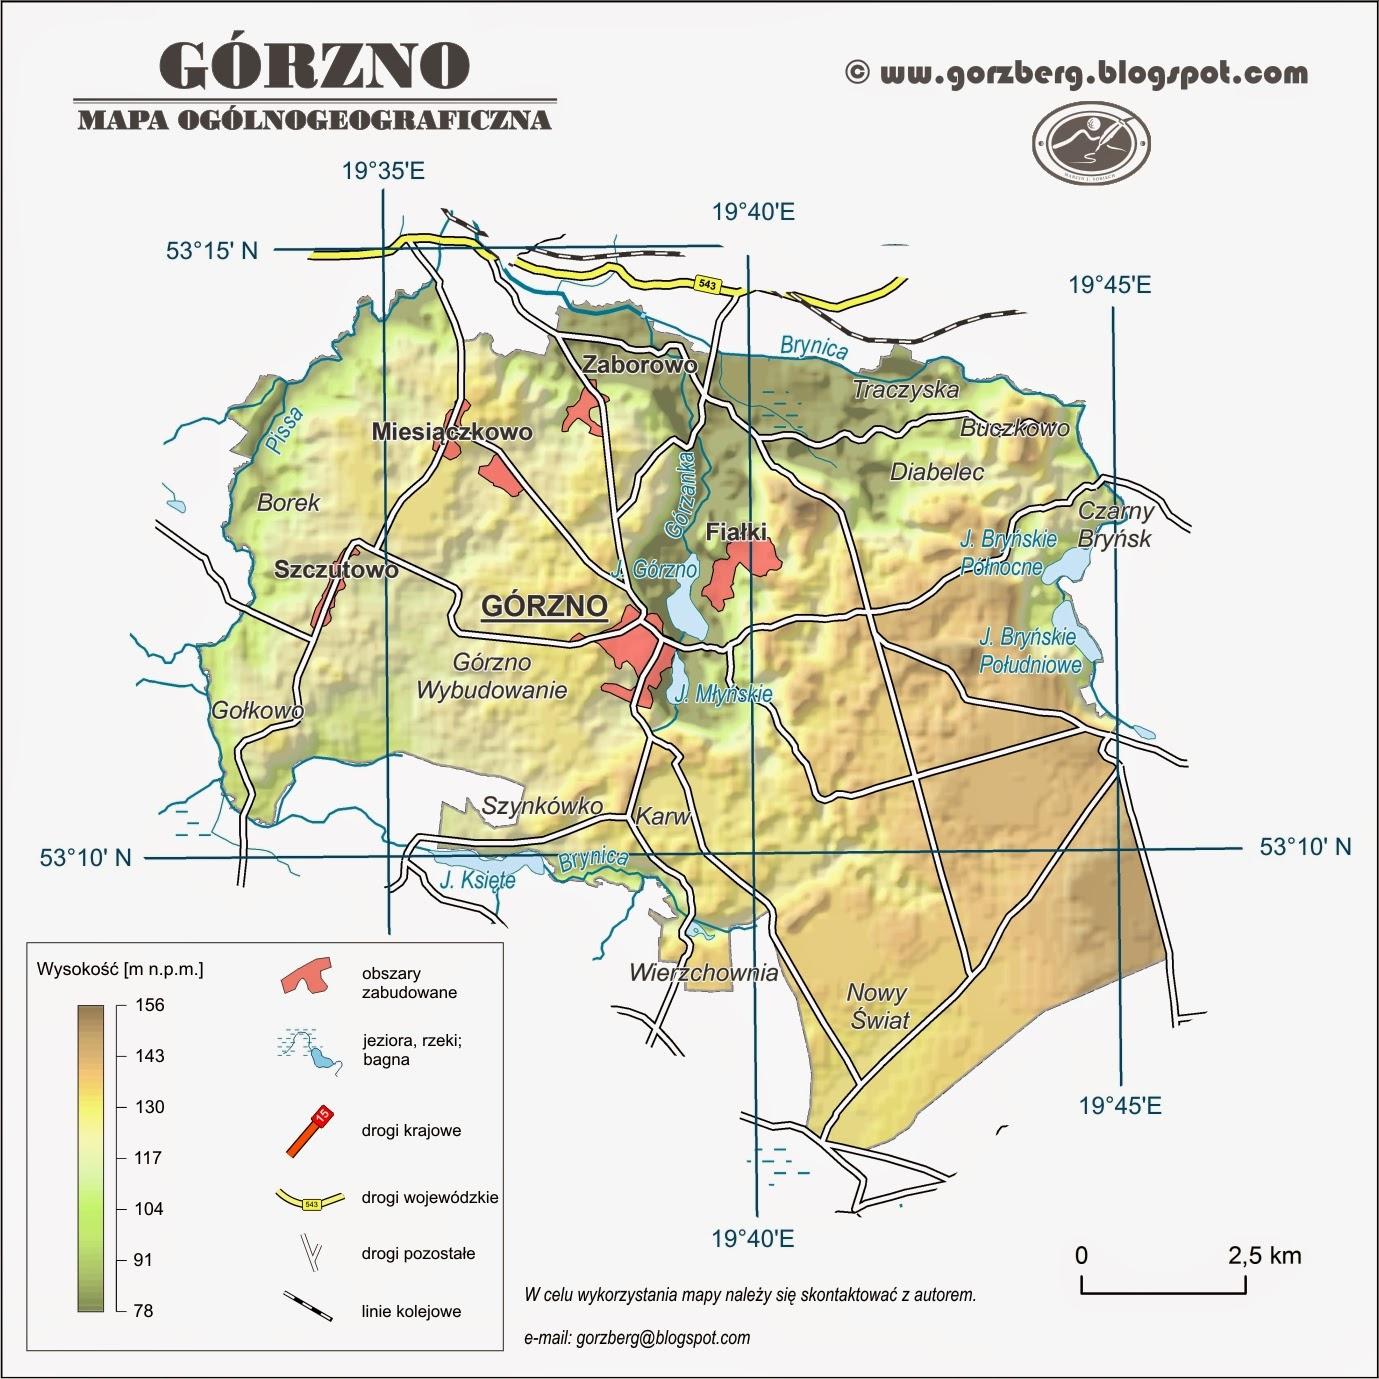 Mapa ogólnogeograficzna gminy Górzno